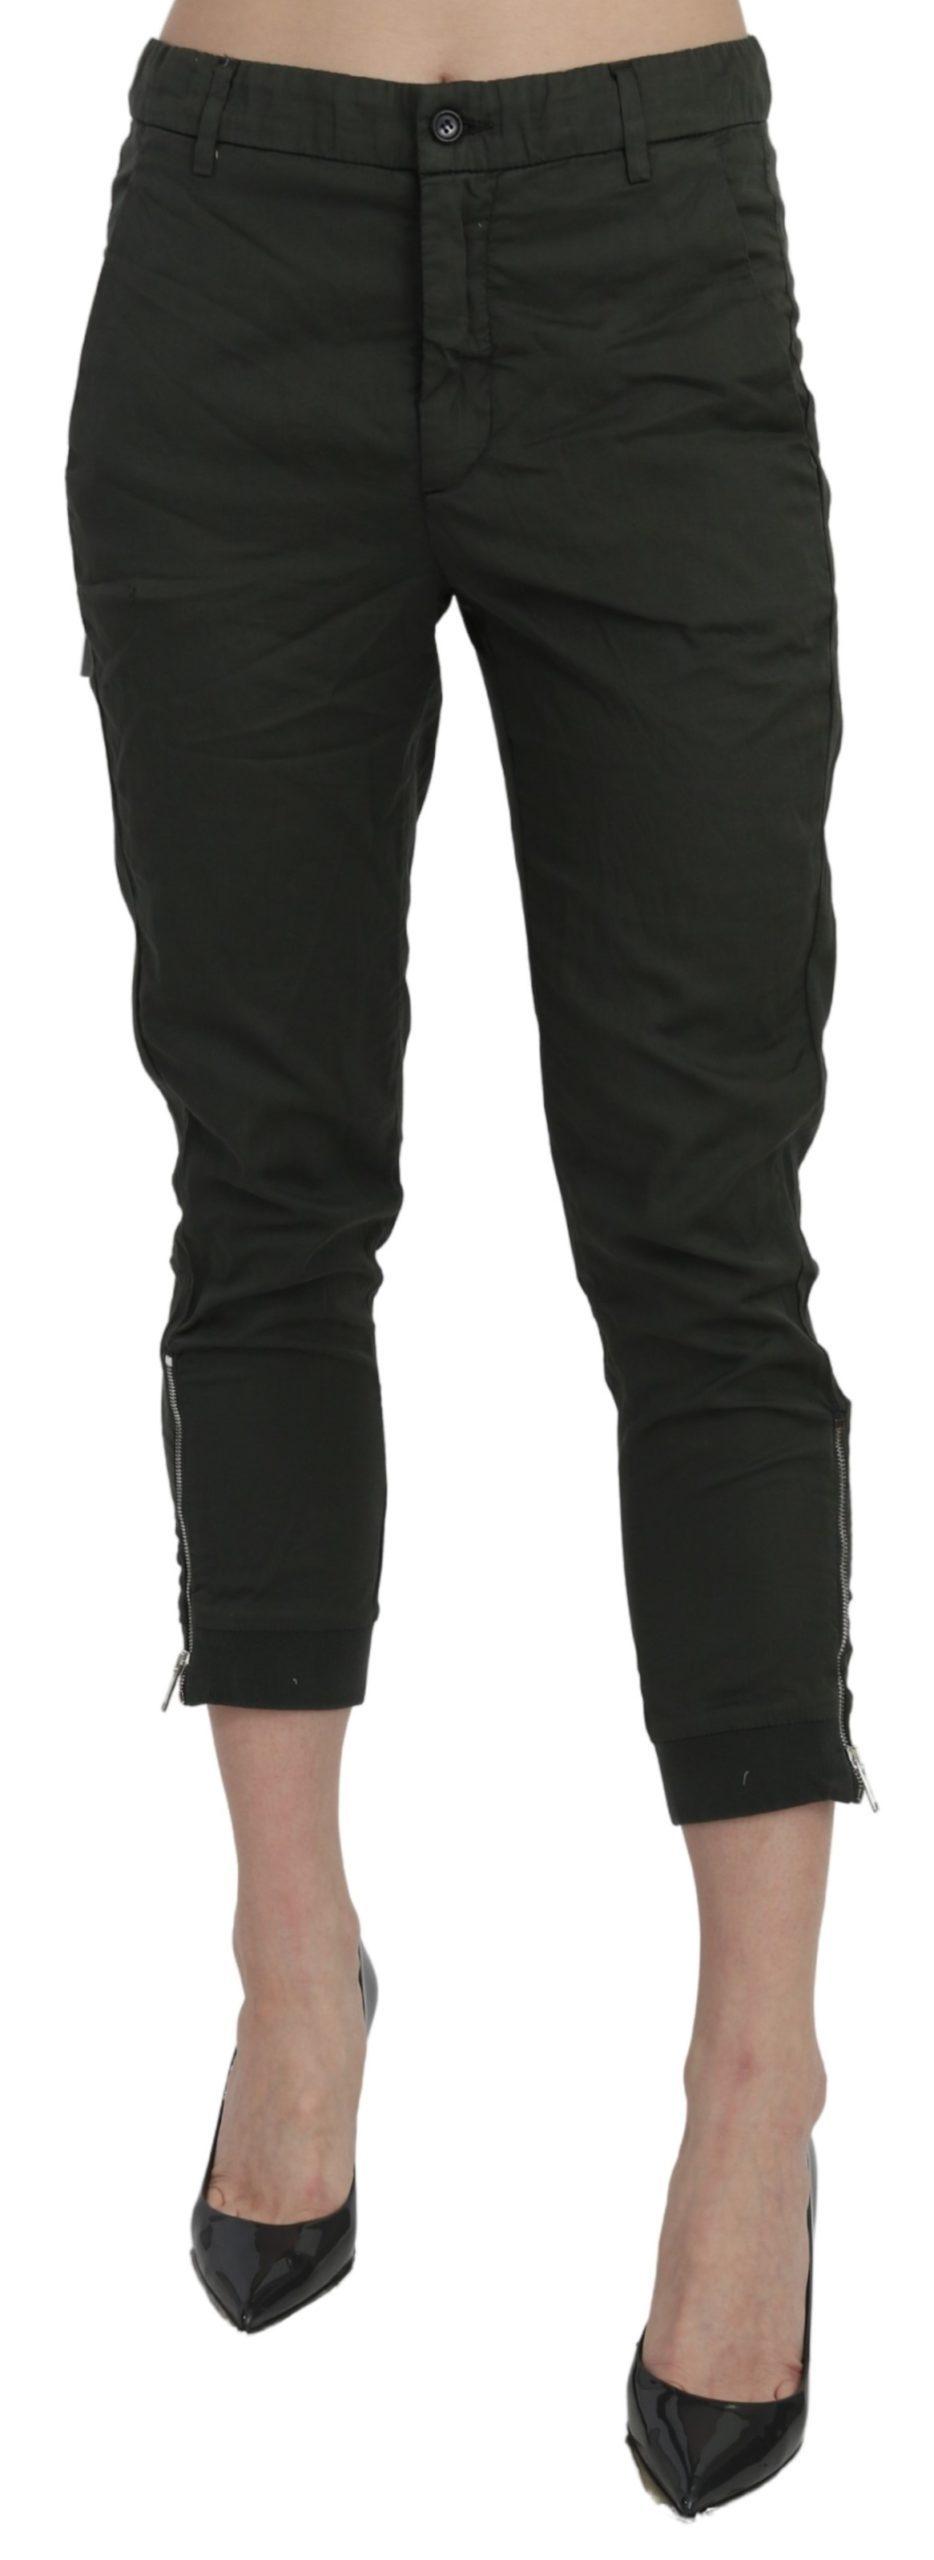 Dondup Women's Mid Waist Skinny Cropped Cotton Trouser Gray PAN70885 - IT40|S